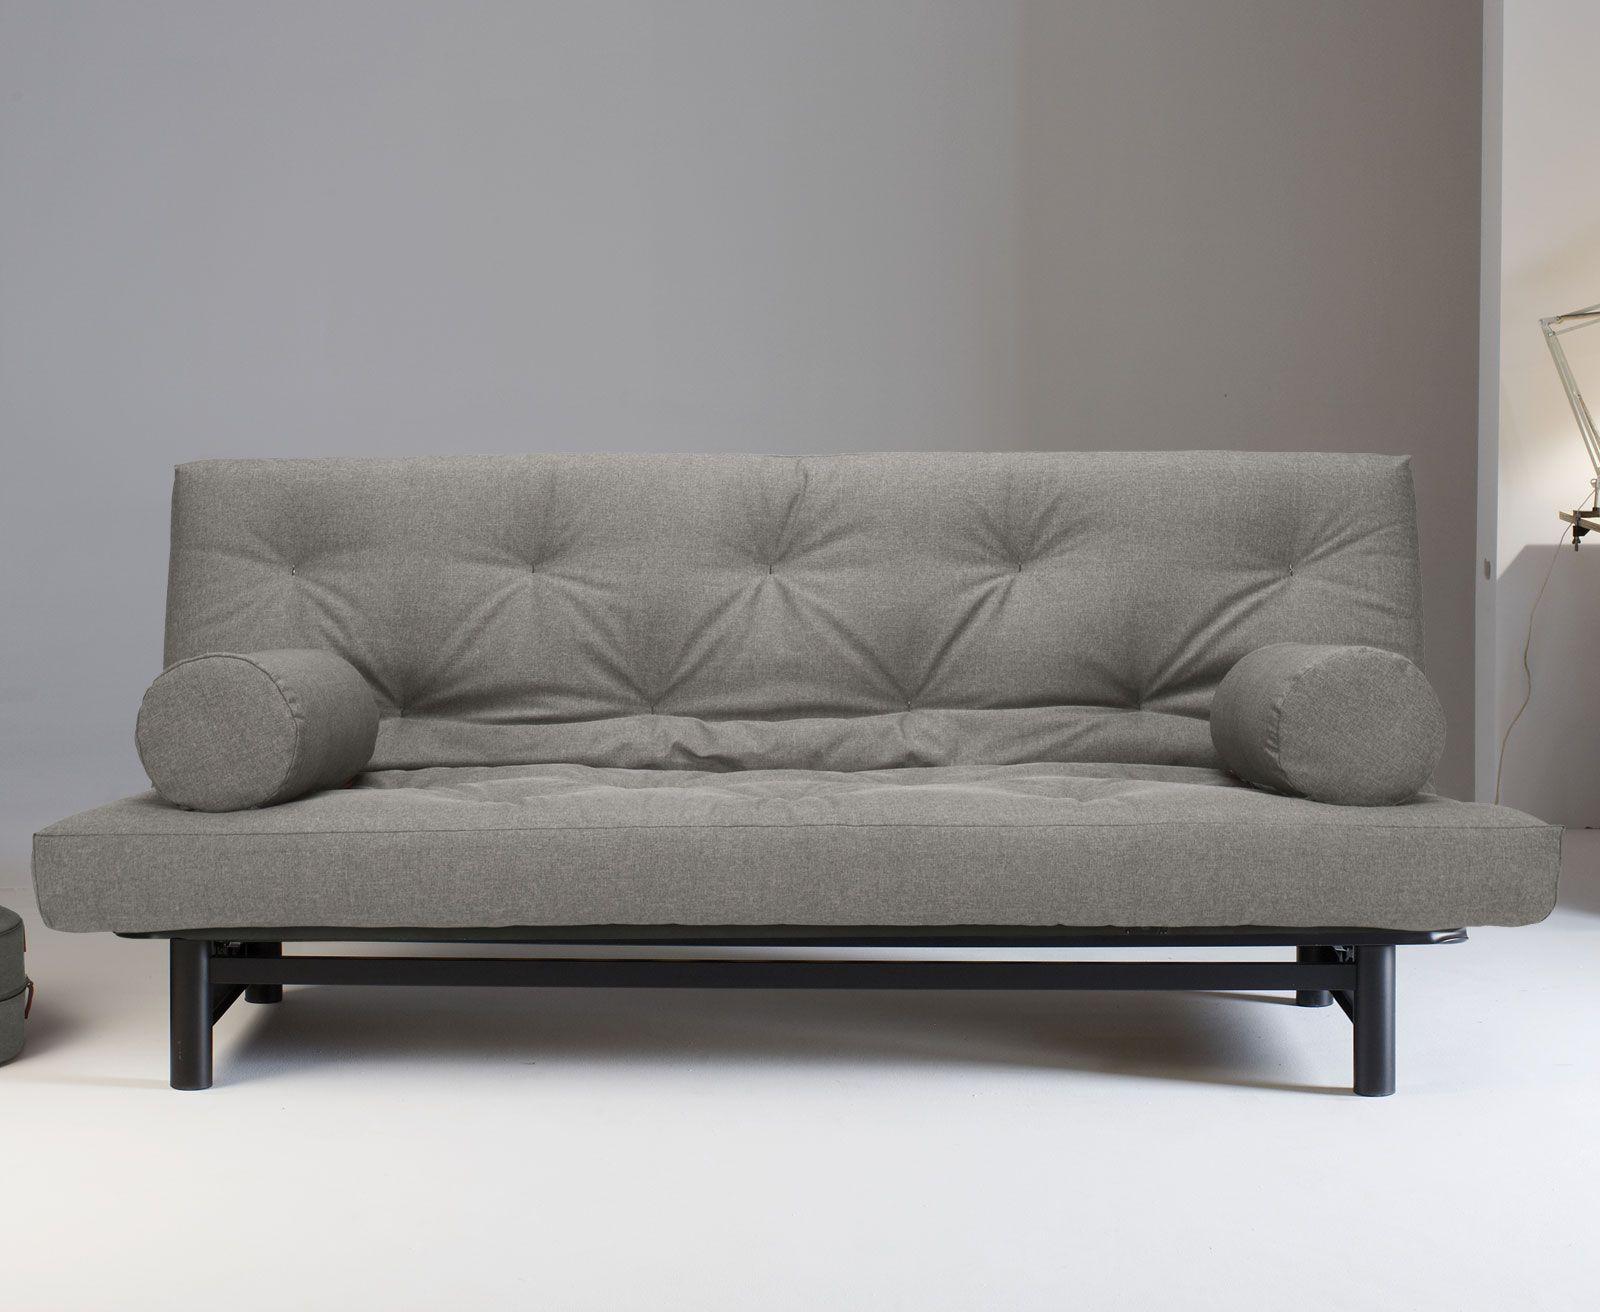 Bequemes Schlafsofa Del Mar In Modernem Design Schlafsofas Couch